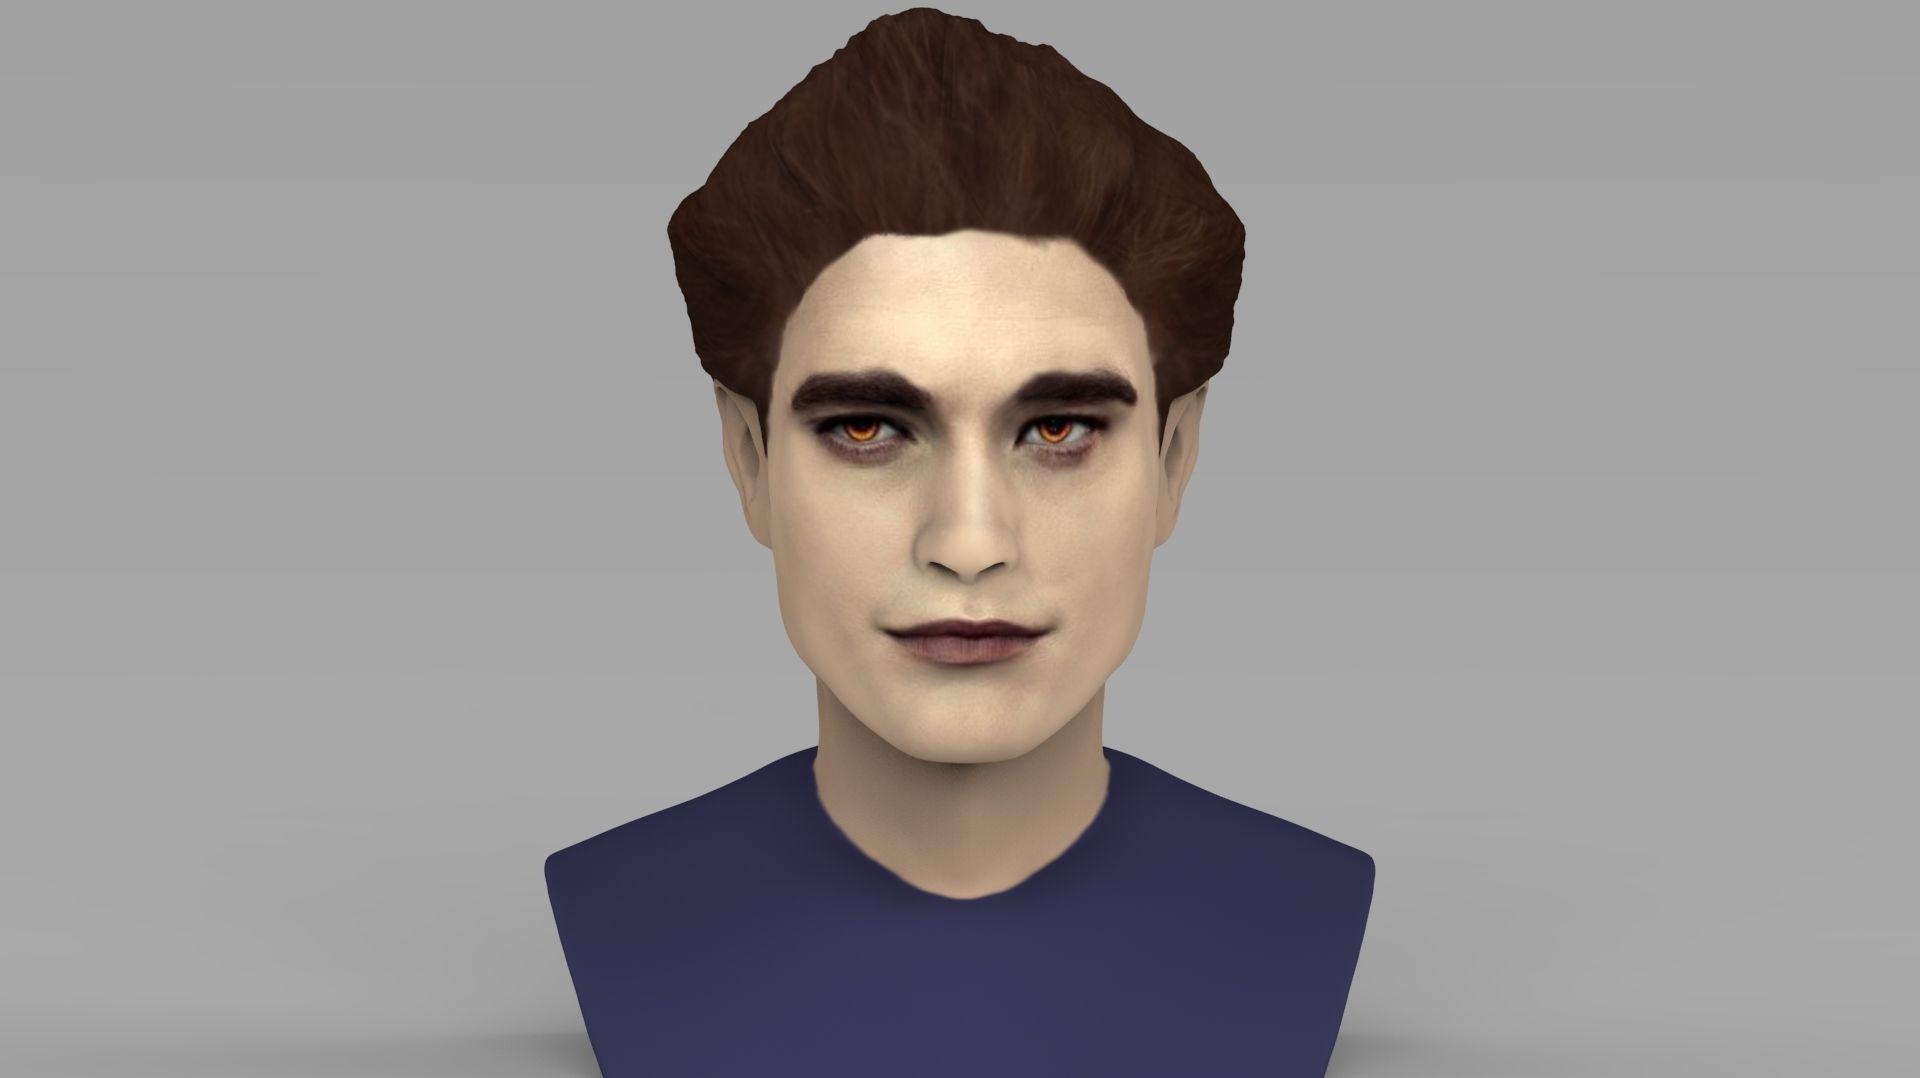 Edward Cullen Twilight Pattinson bust full color 3D printing